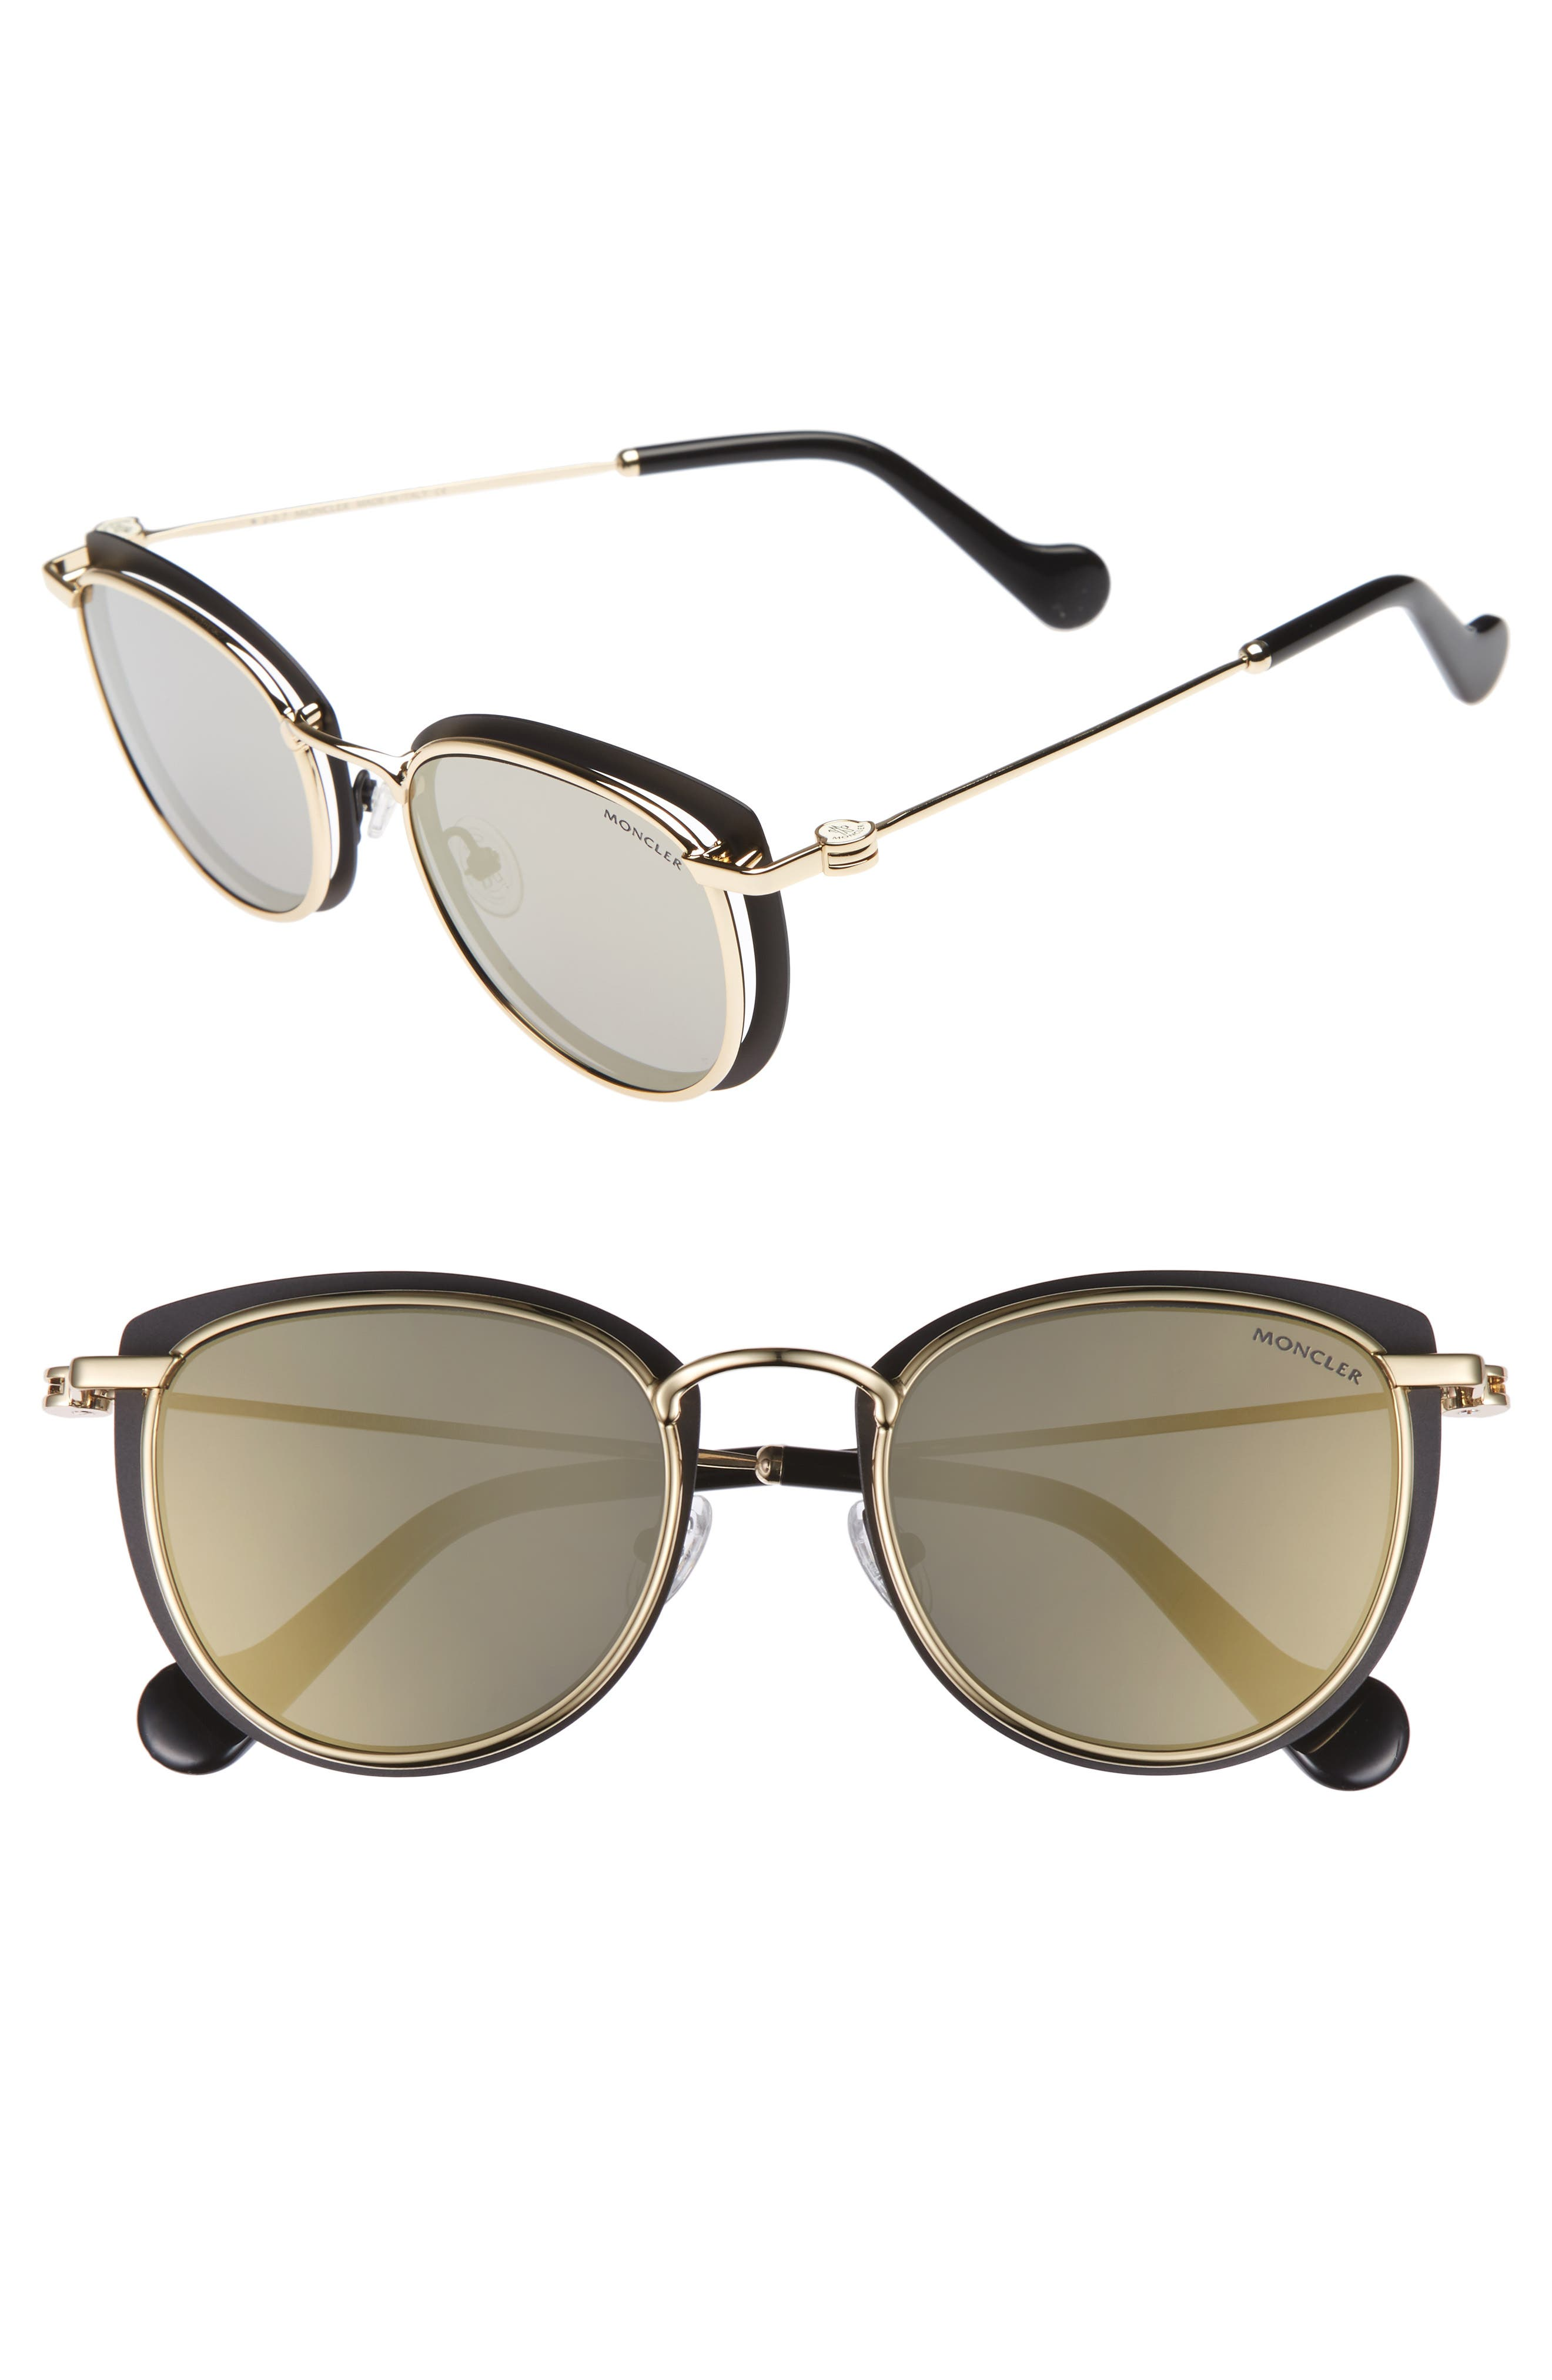 50mm Mirrored Geometric Sunglasses,                             Main thumbnail 1, color,                             Black/ Pale Gold/ Smoke/ Gold